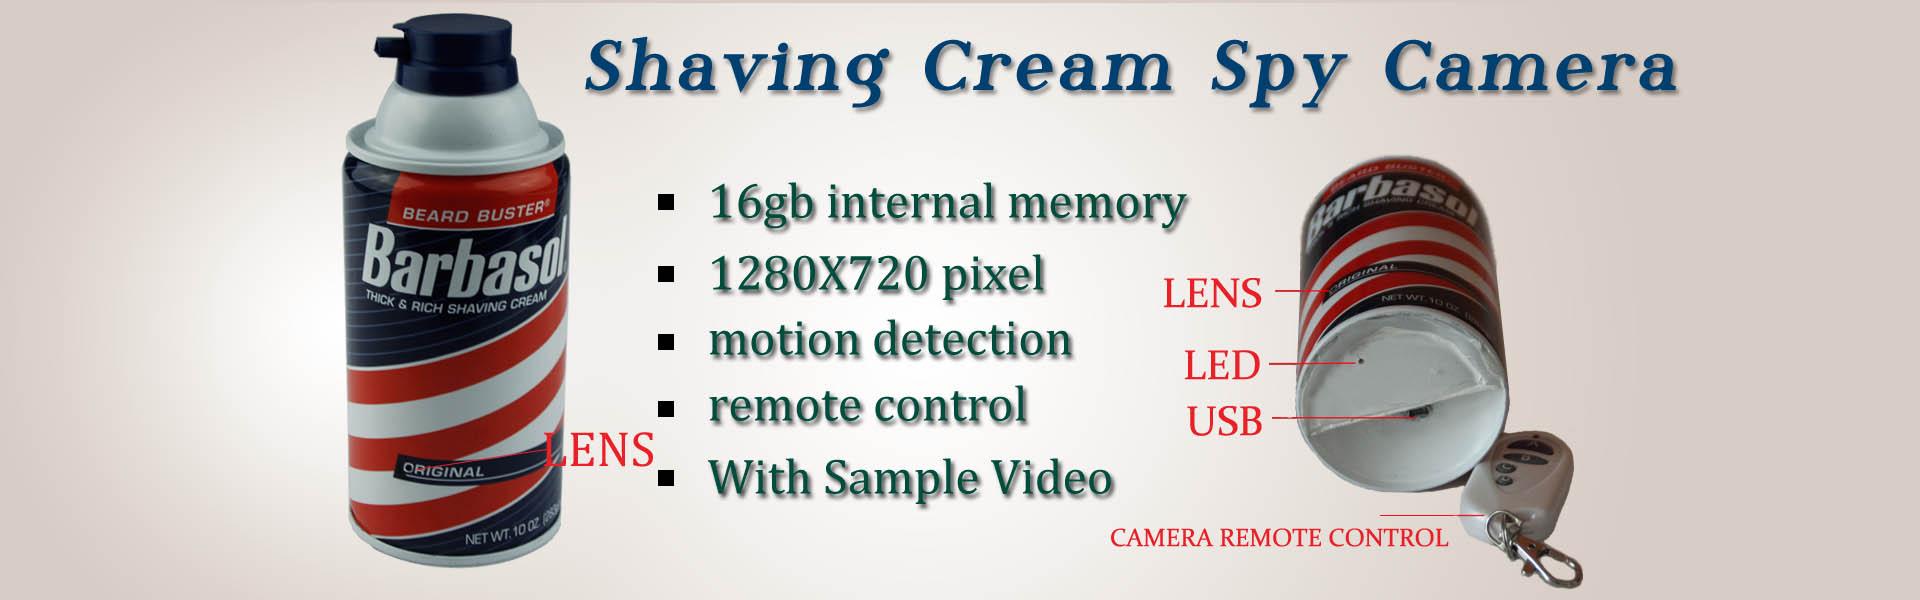 Shaving Cream Pinhole Bathroom Spy Camera DVR HD 1920X1080 32GB(Motion Activated,Remote Control )